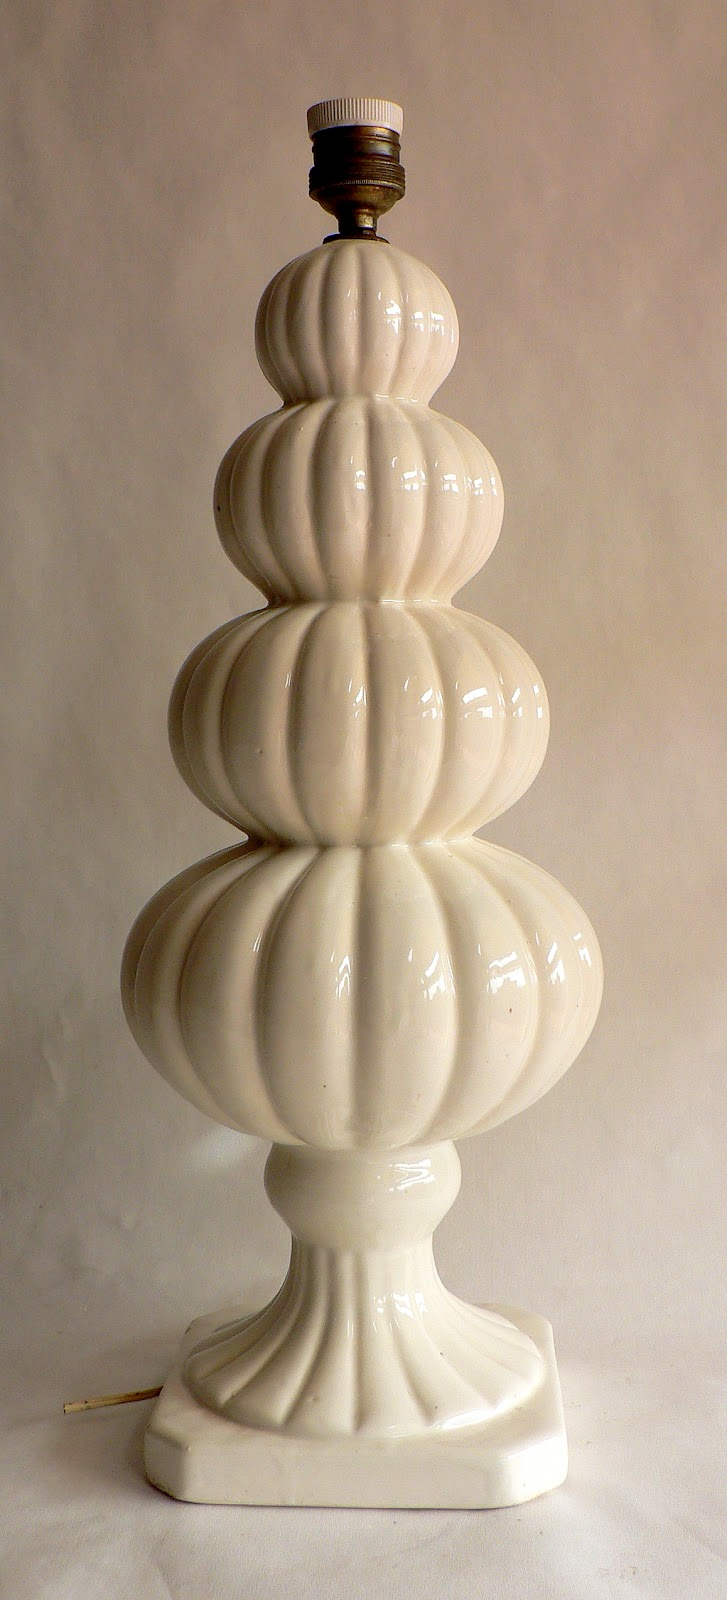 Vintage kitsch siglo xx lampara de ceramica de alcora o for Lamparas de ceramica